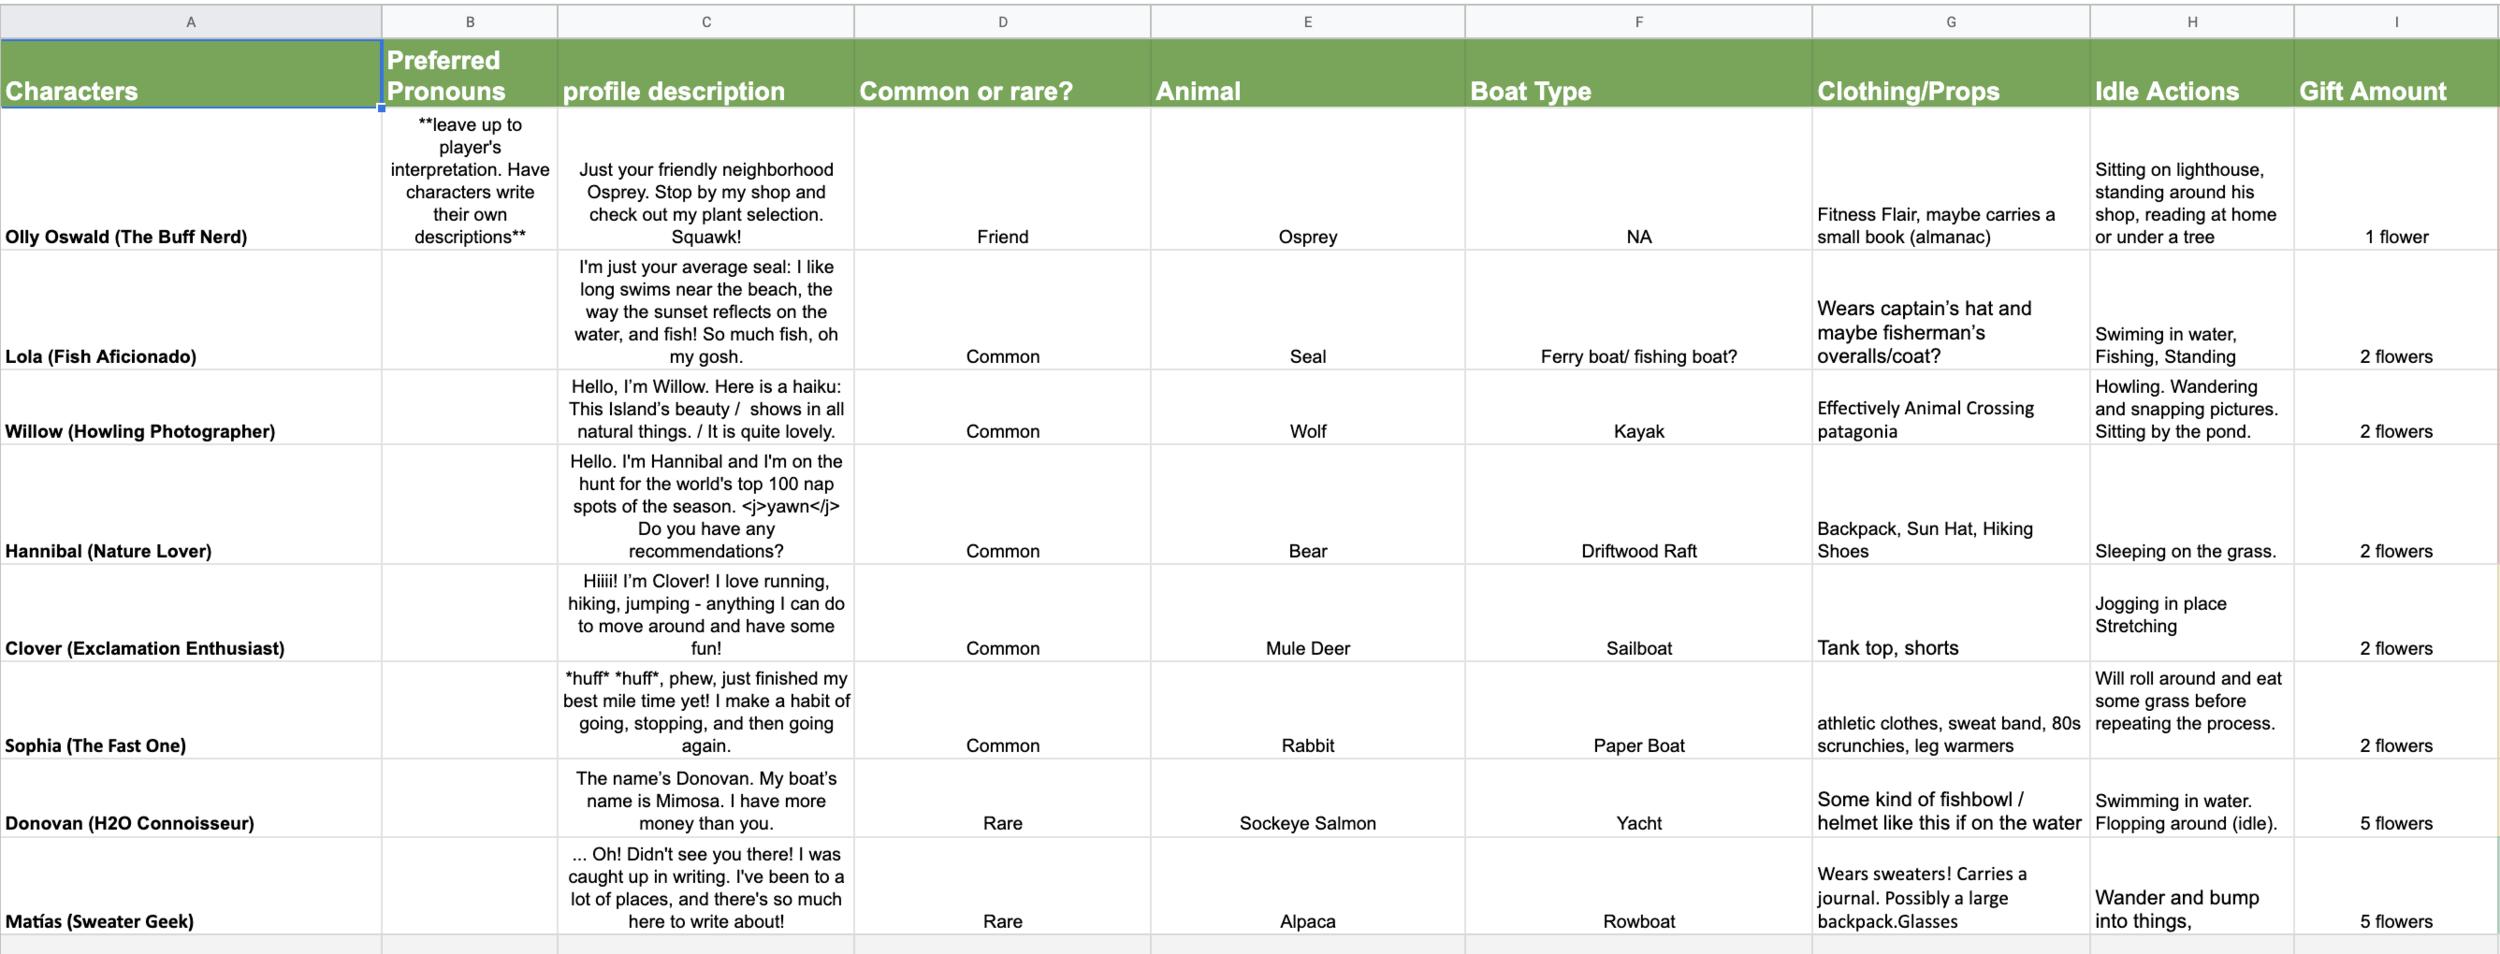 The team's character brainstorm spreadsheet.